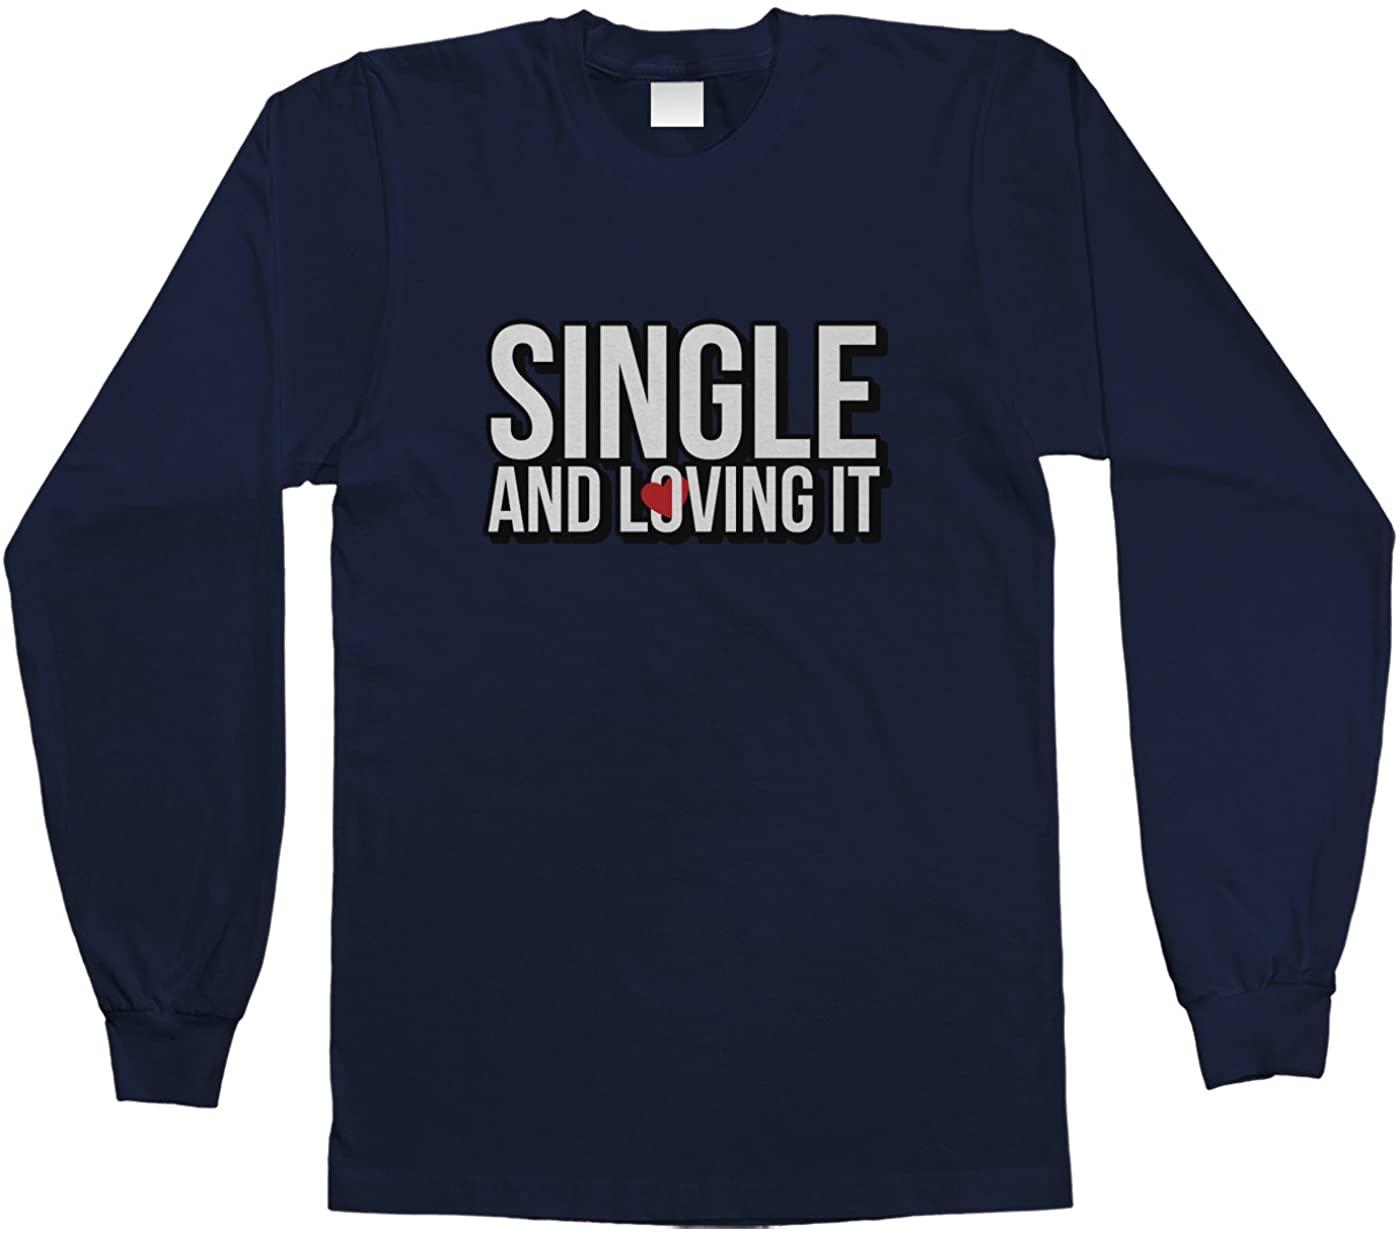 Threadrock Big Boys Single and Loving It Youth Long Sleeve T-Shirt